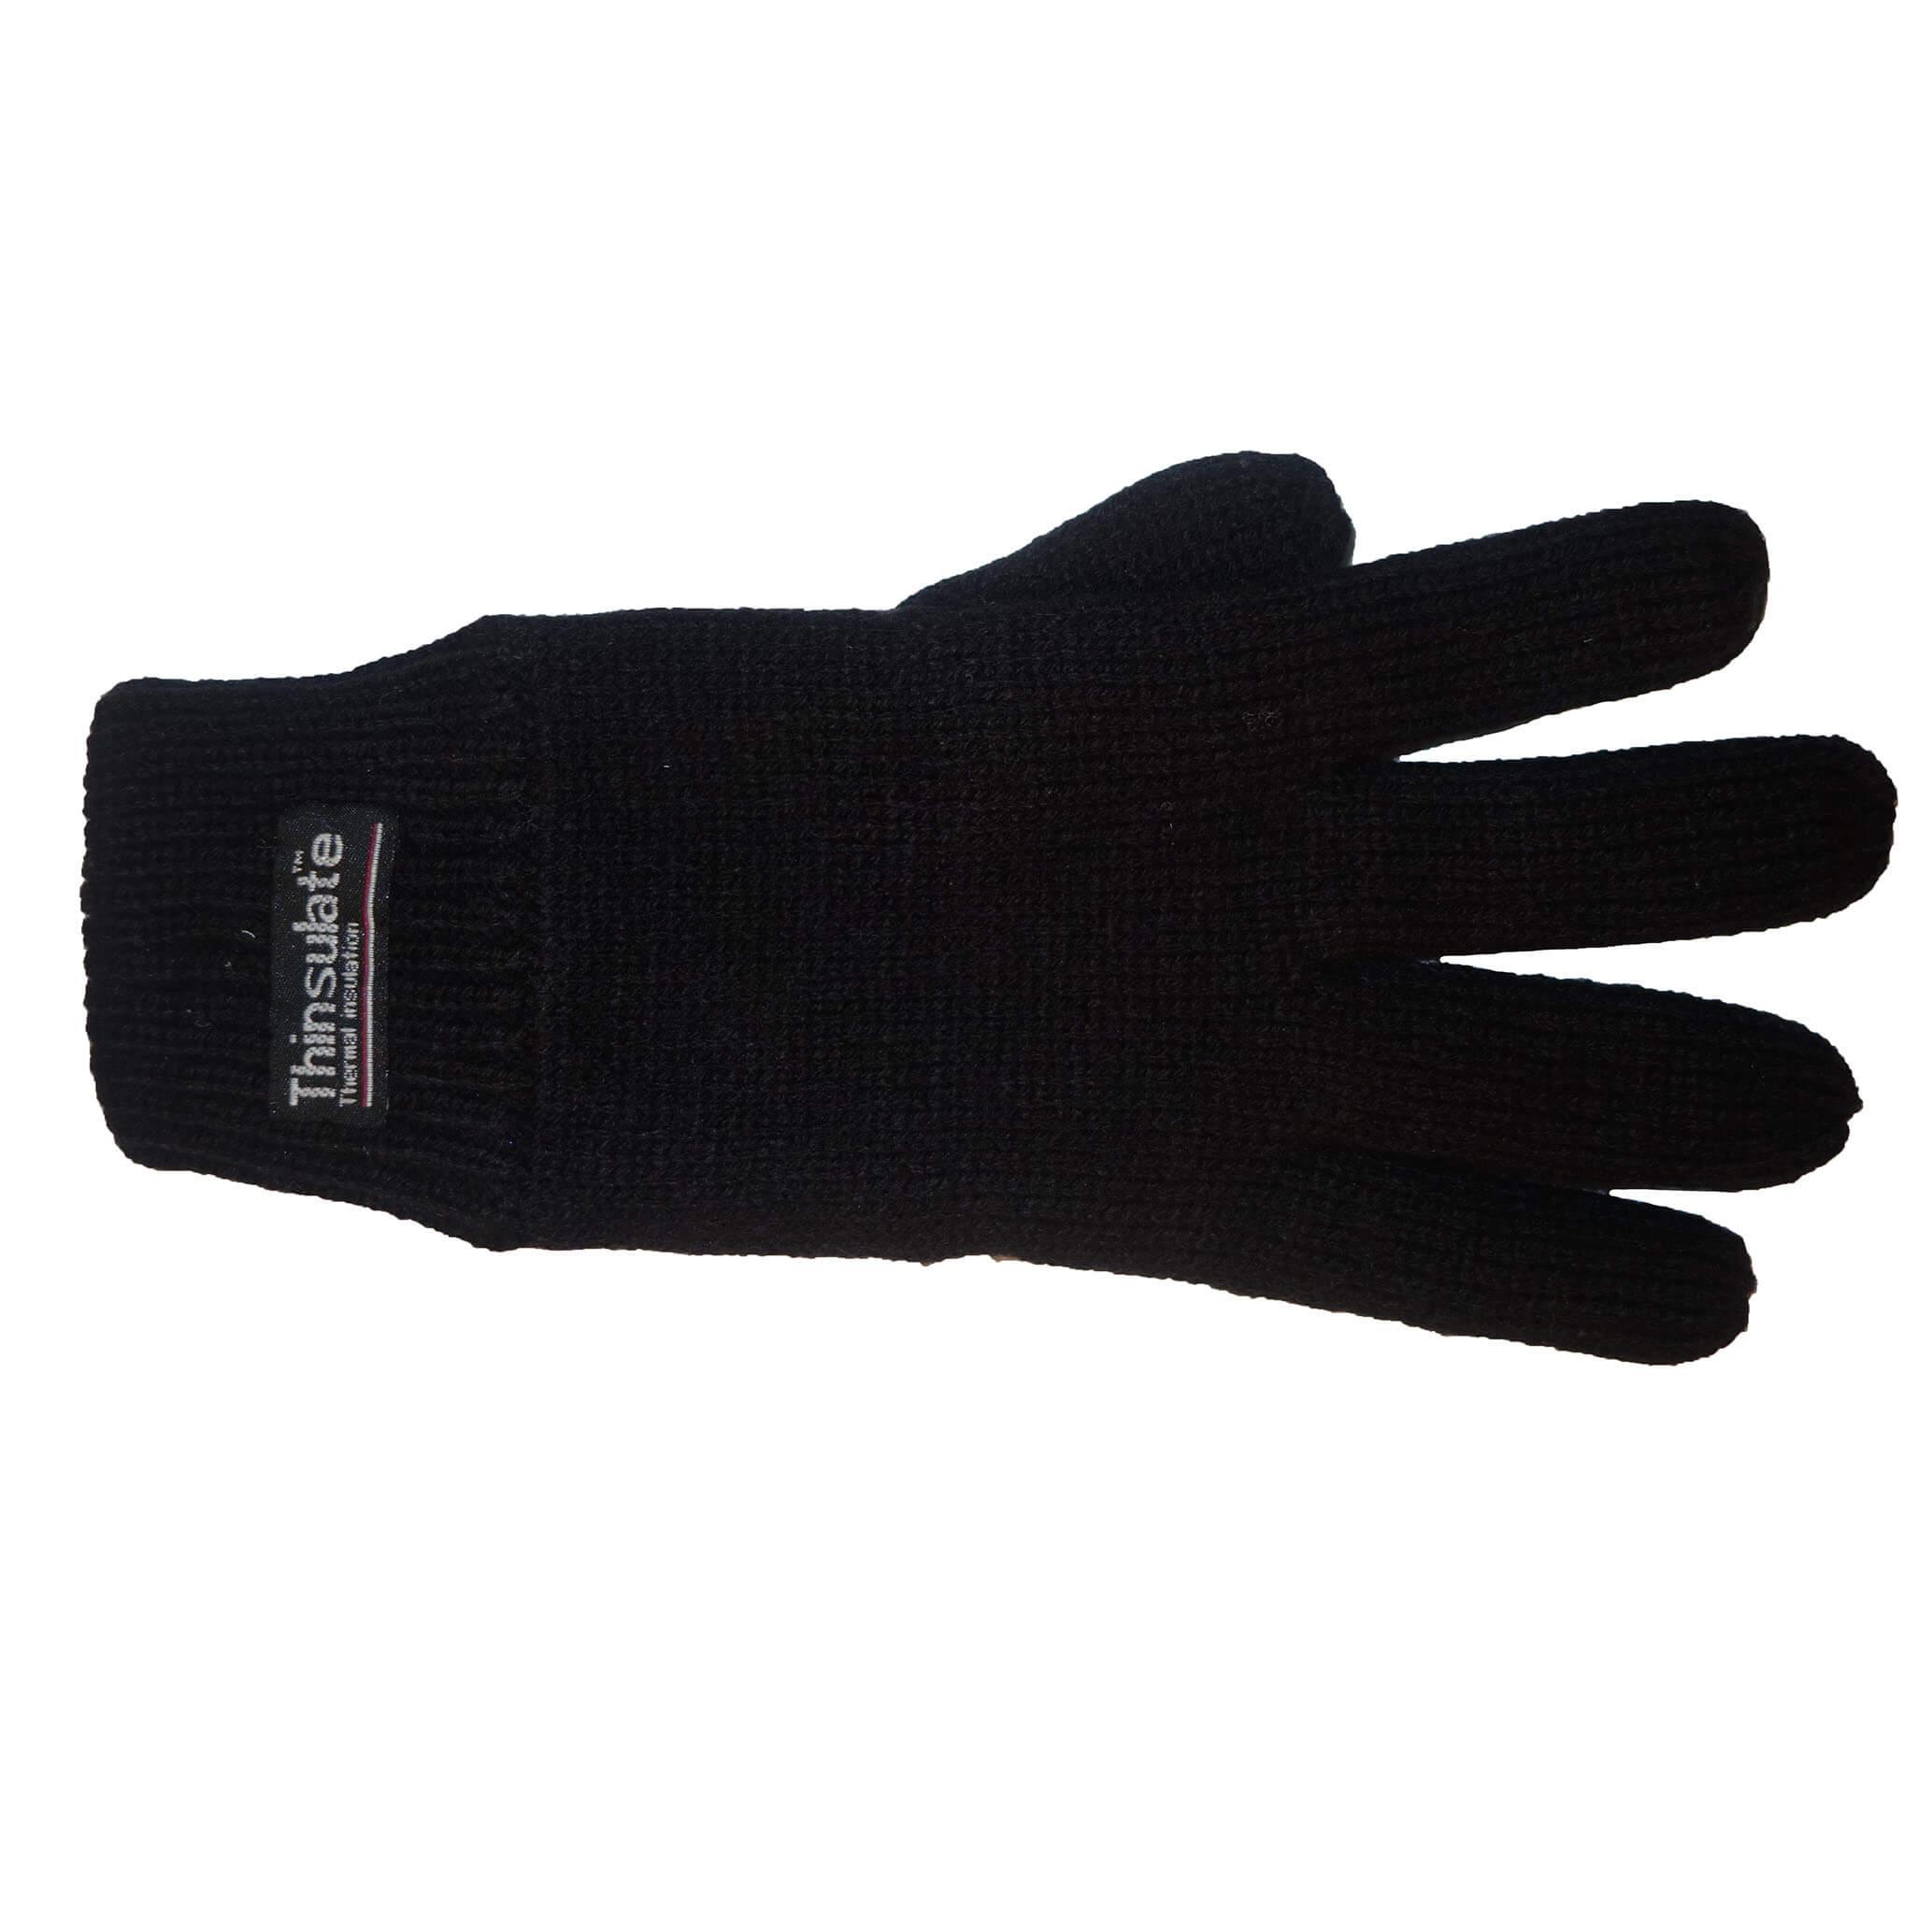 Thinsulate Handschoenen Zwart S/M-0